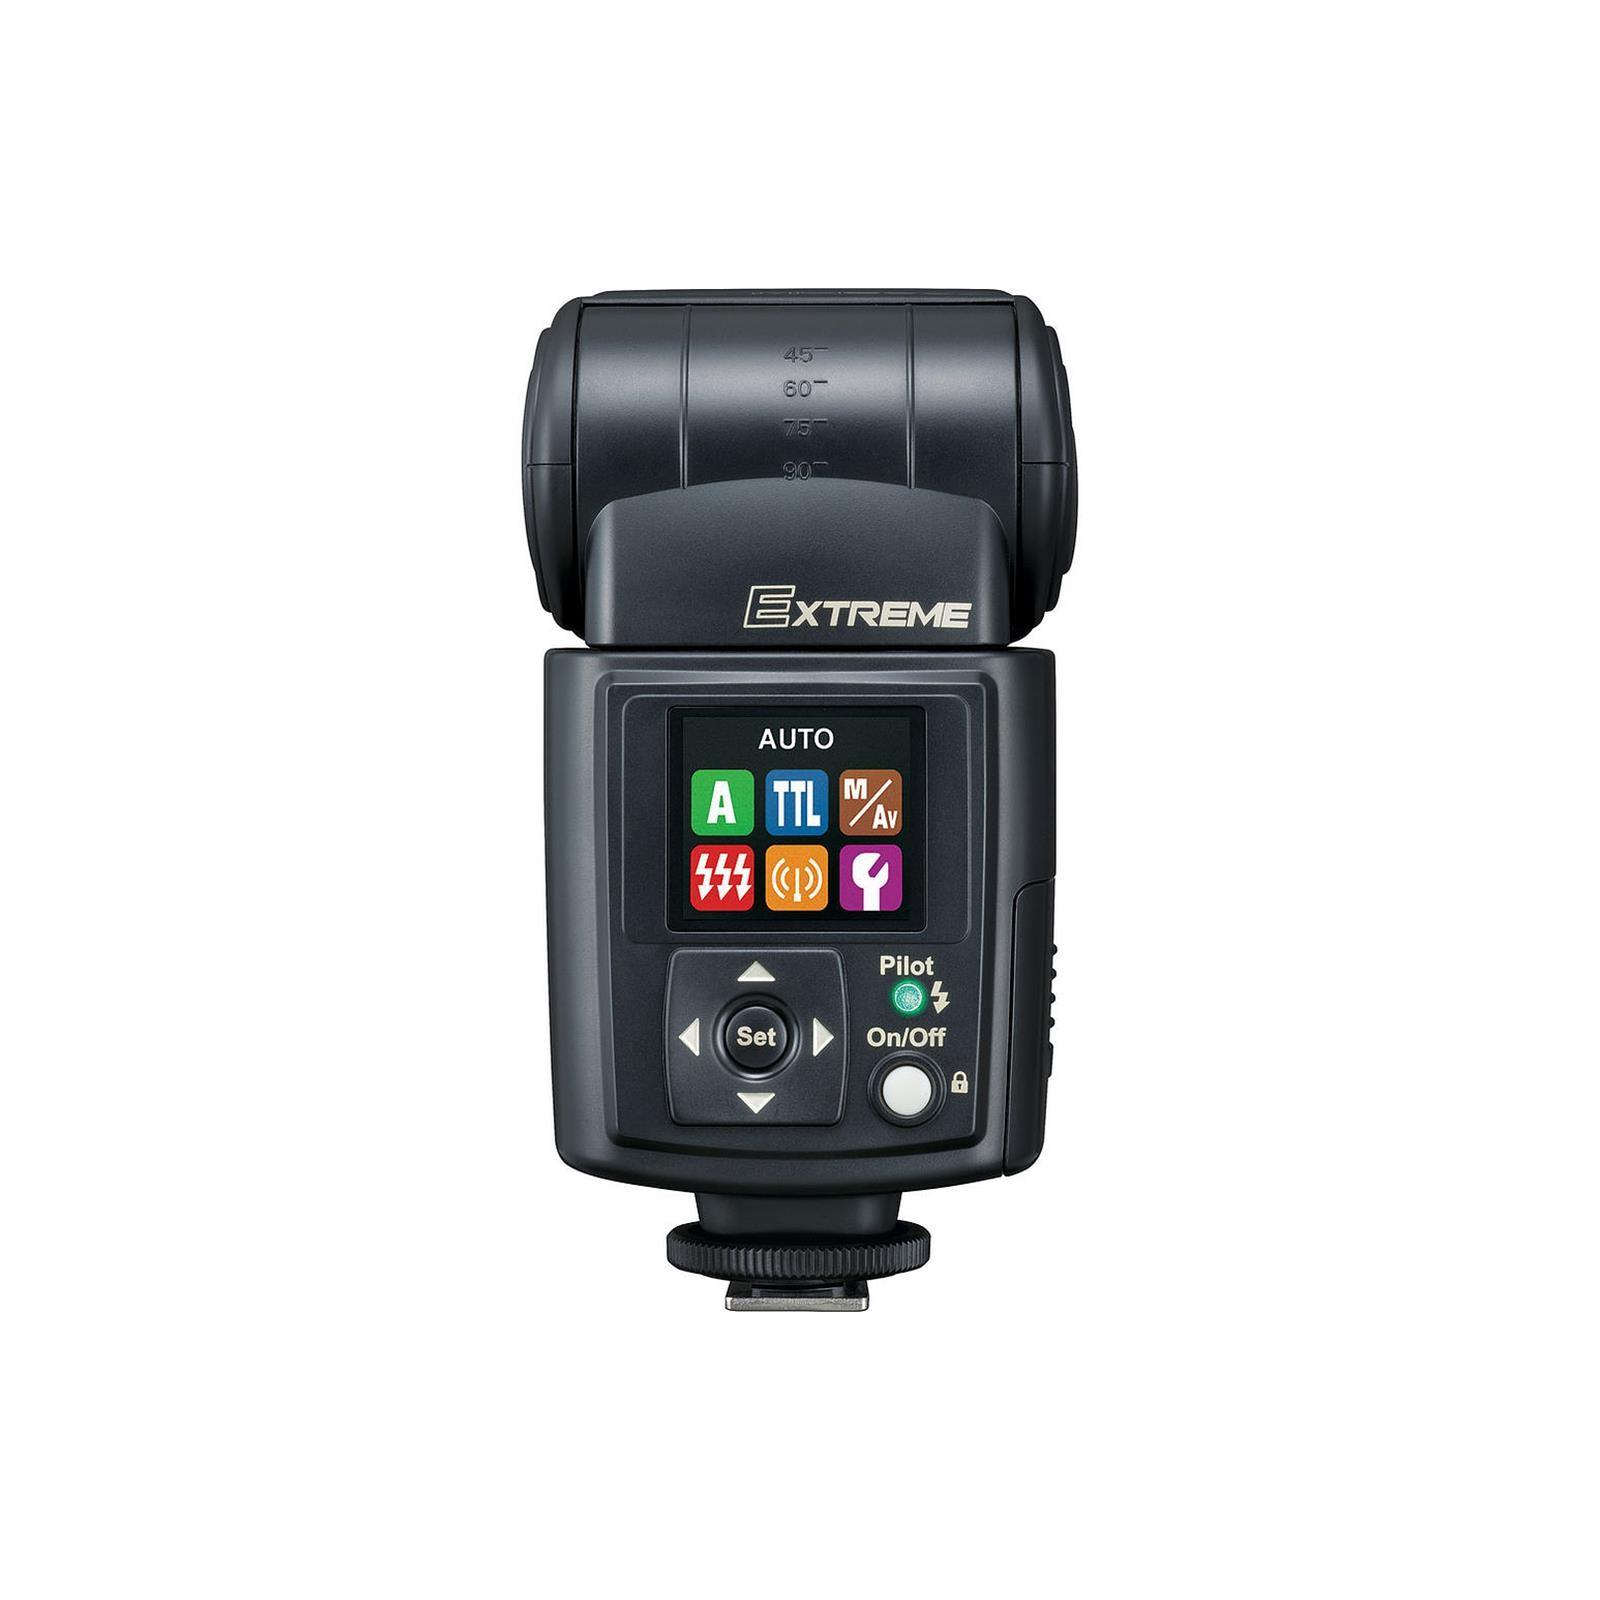 Вспышка Nissin MG8000 Canon (NI-N066) изображение 2